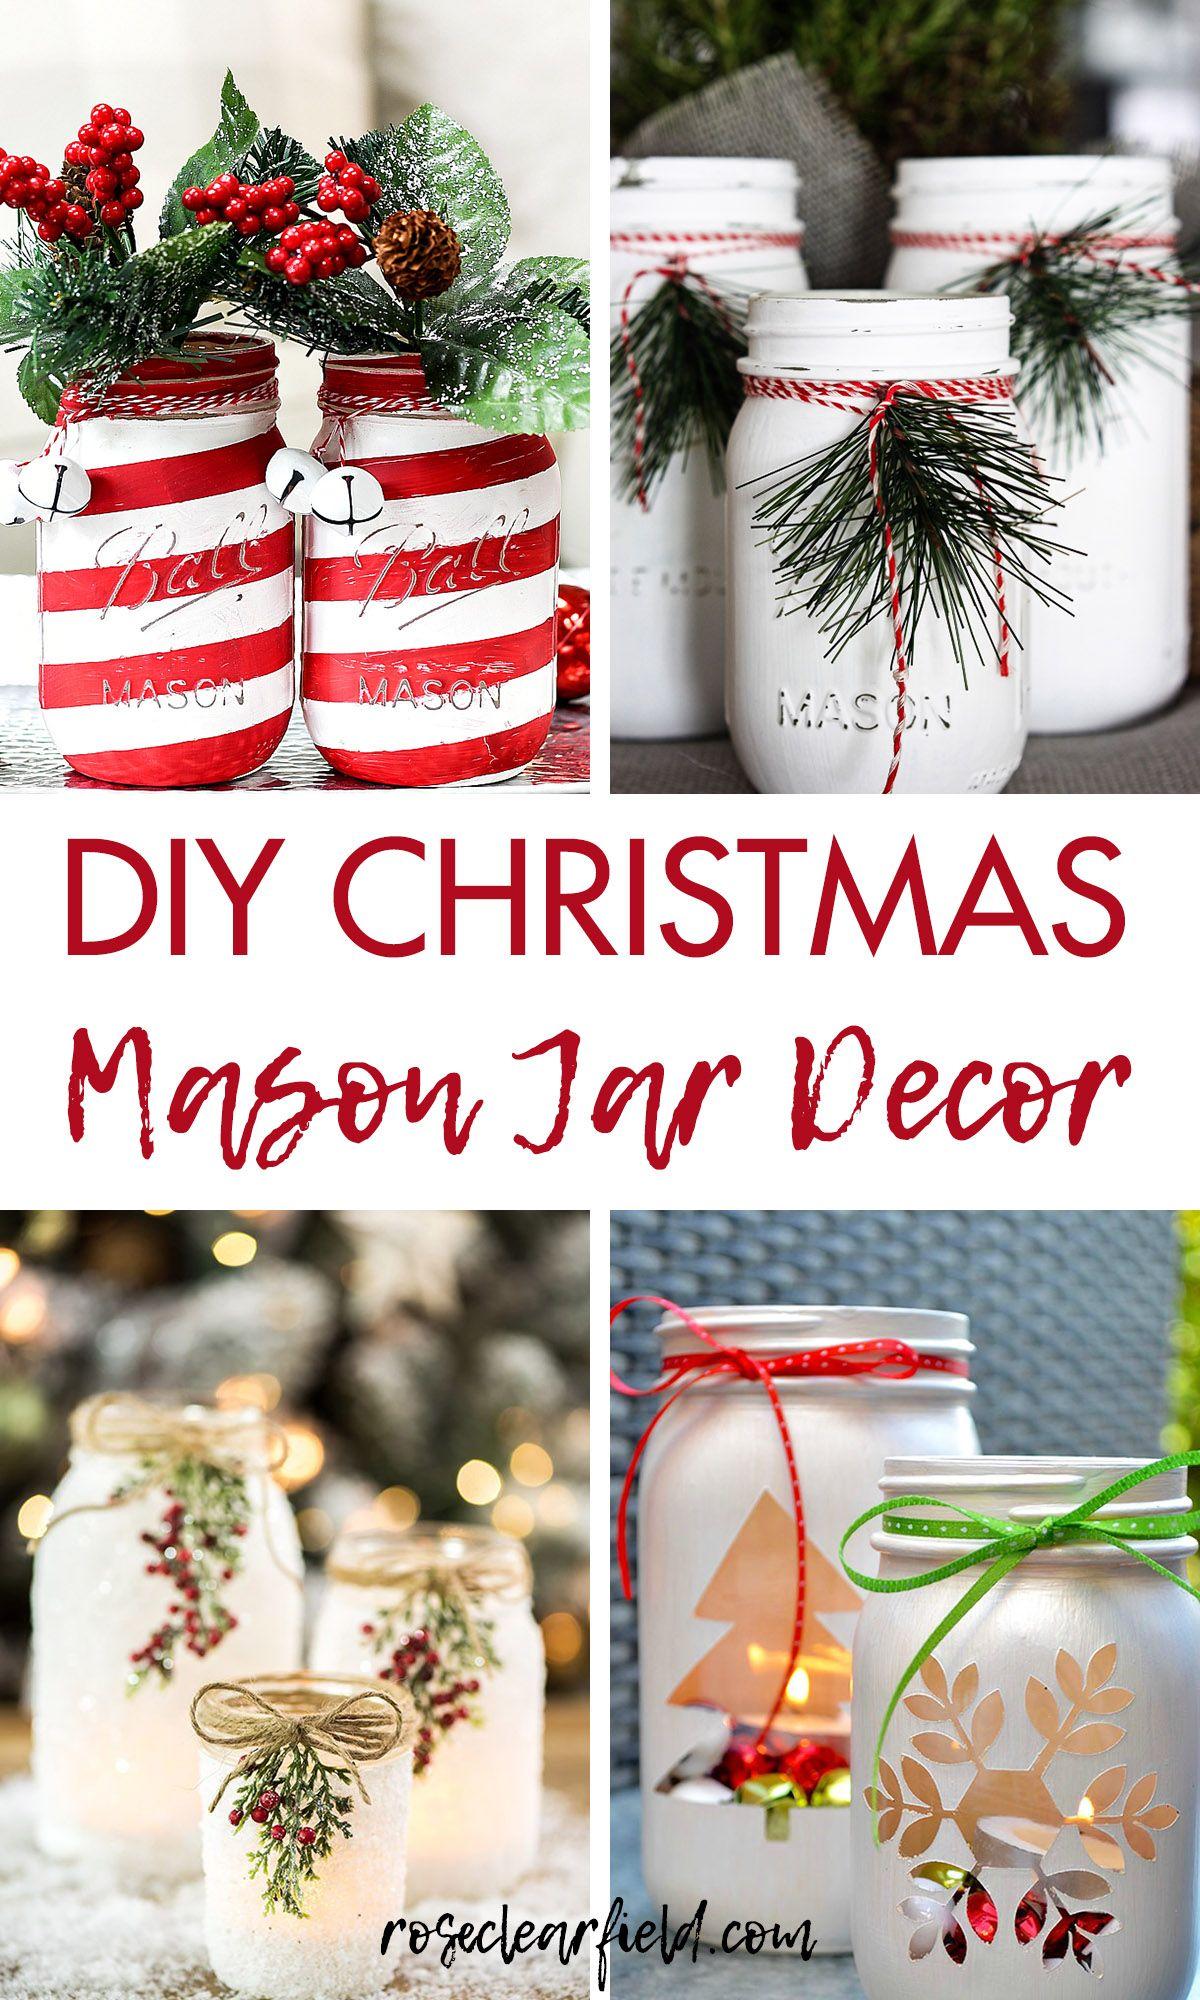 DIY Christmas Mason Jar Decor